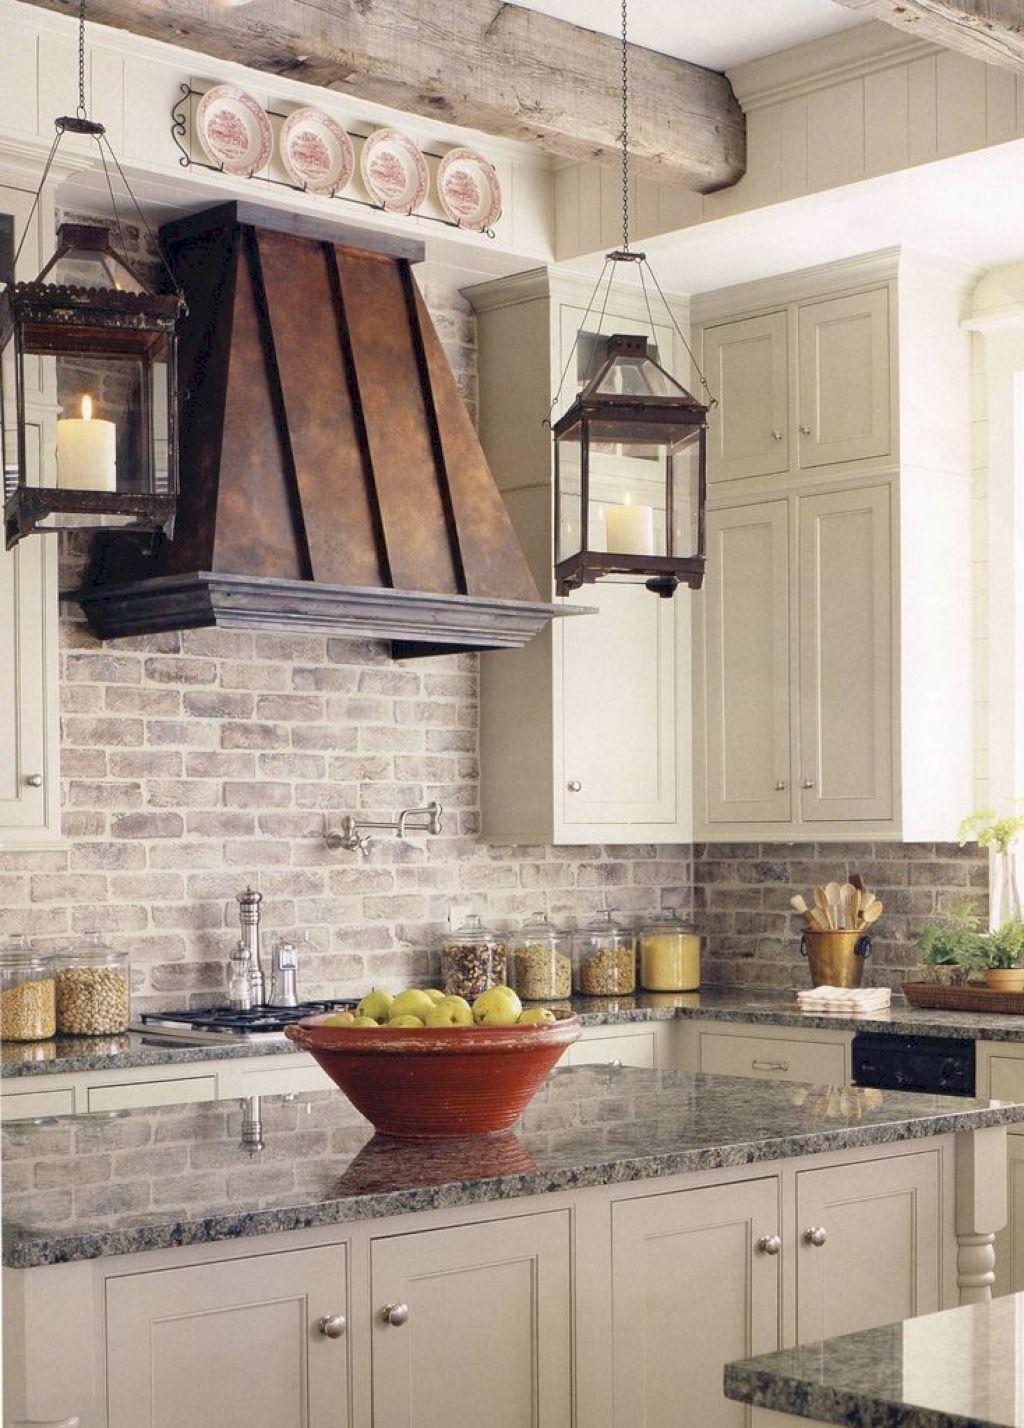 38 Beauty Kitchen Backsplash Design Ideas | Decoración de cocina ...